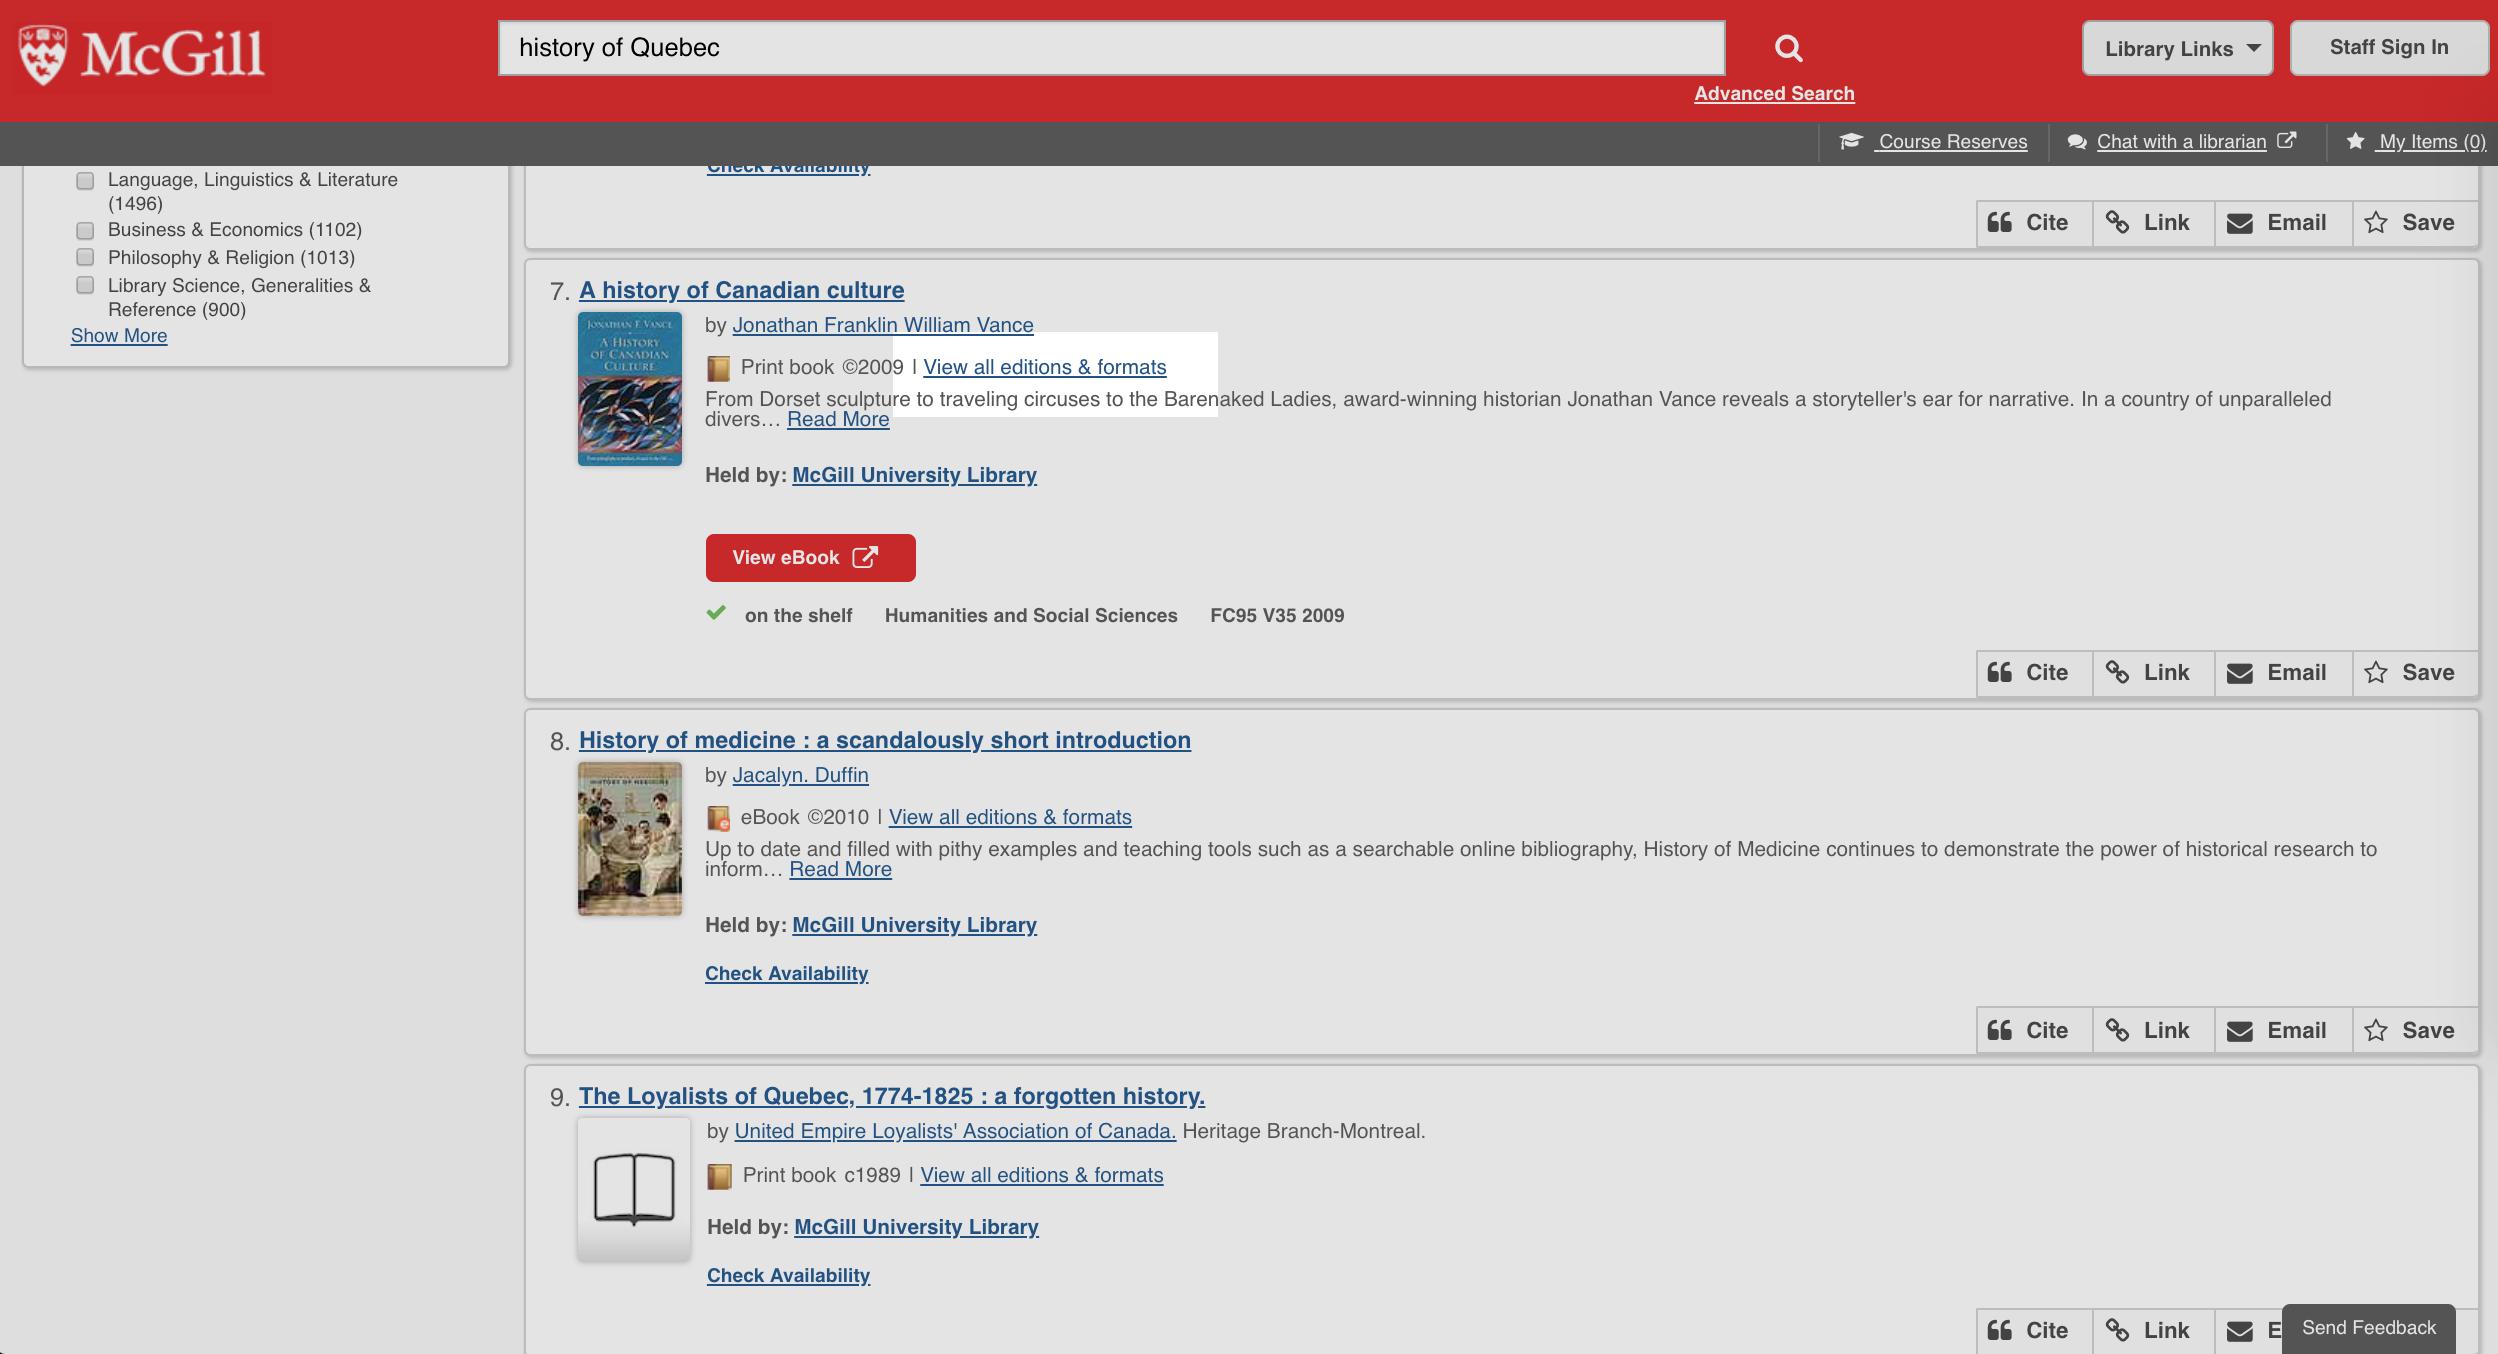 Find books & media | McGill Library - McGill University